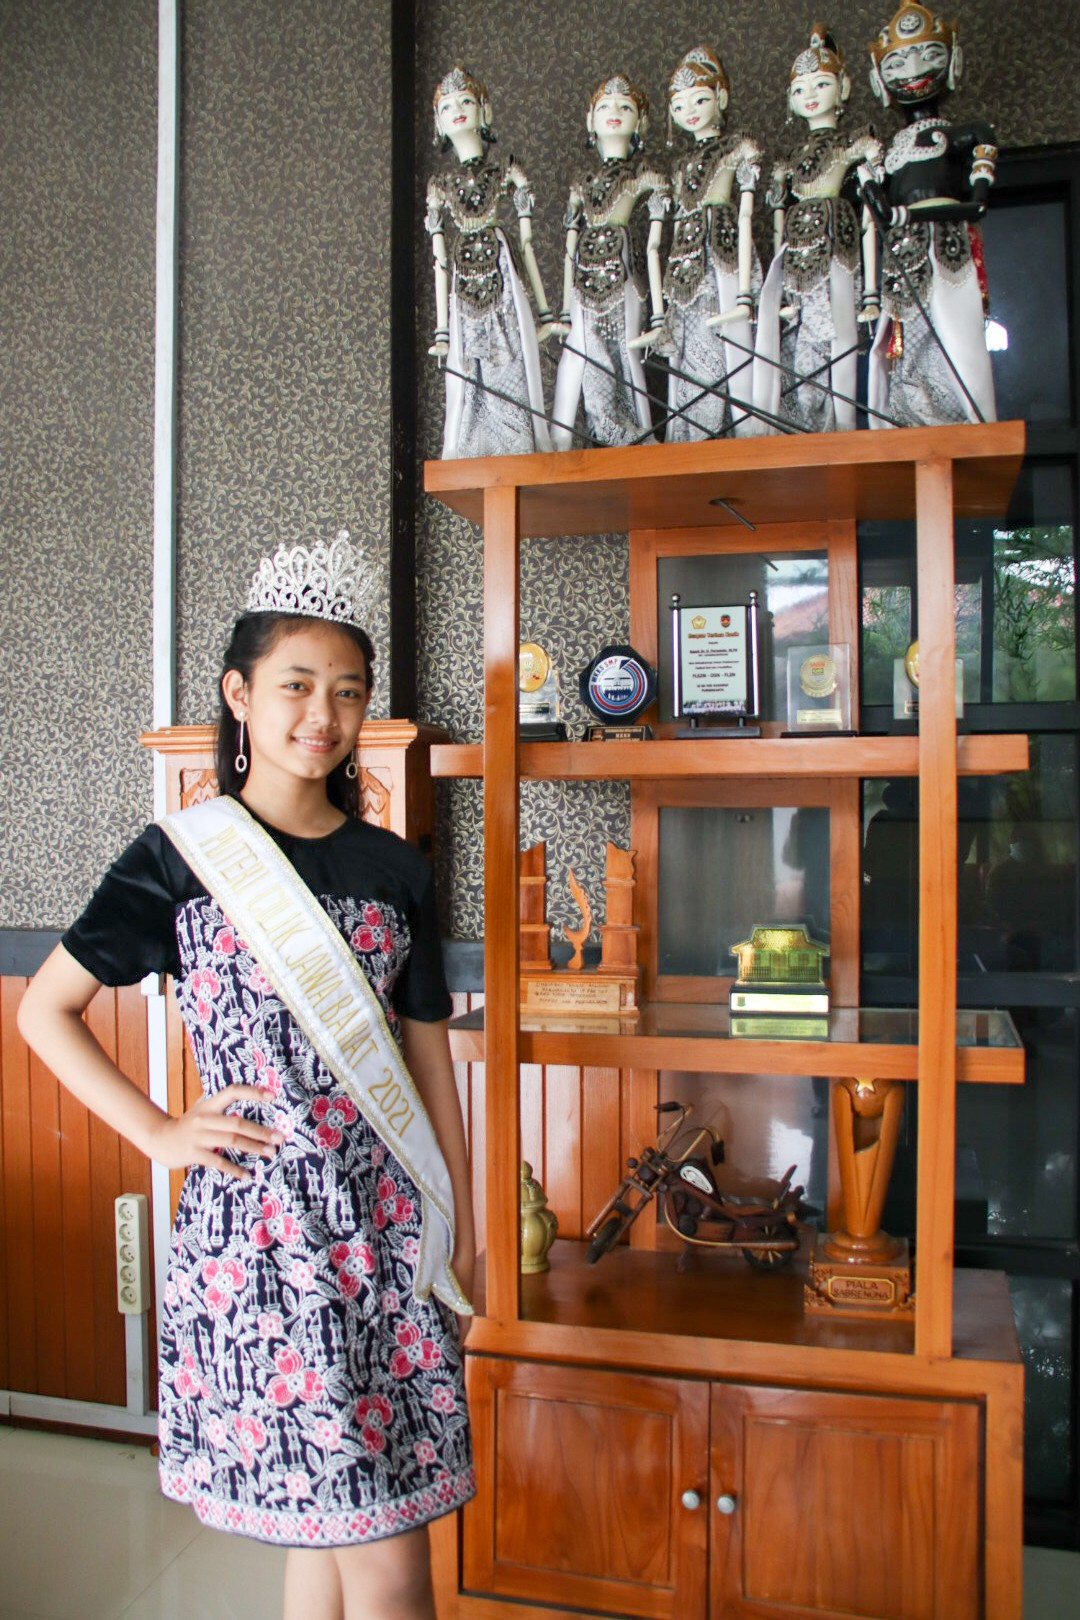 Pelajar Purwakarta Terpilih Sebagai Puteri Cilik Indonesia Jawa Barat